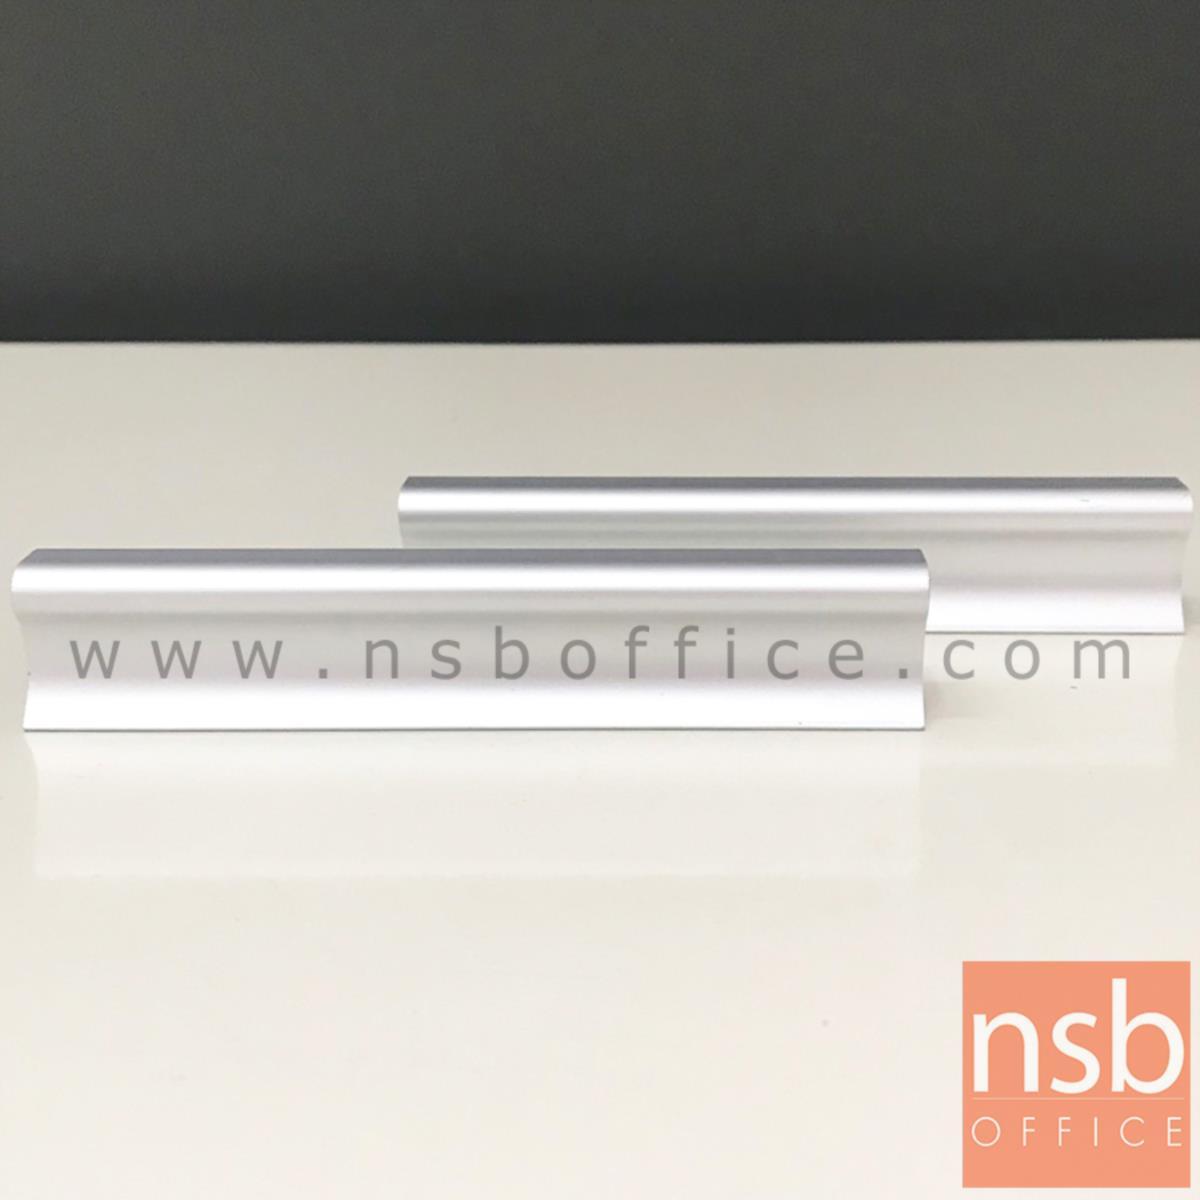 F10A002:มือจับตู้ อลูมิเนียมสีเงินด้านทรงขนมปัง รุ่น NSB-HAND1  (ขนาด 96 mm)